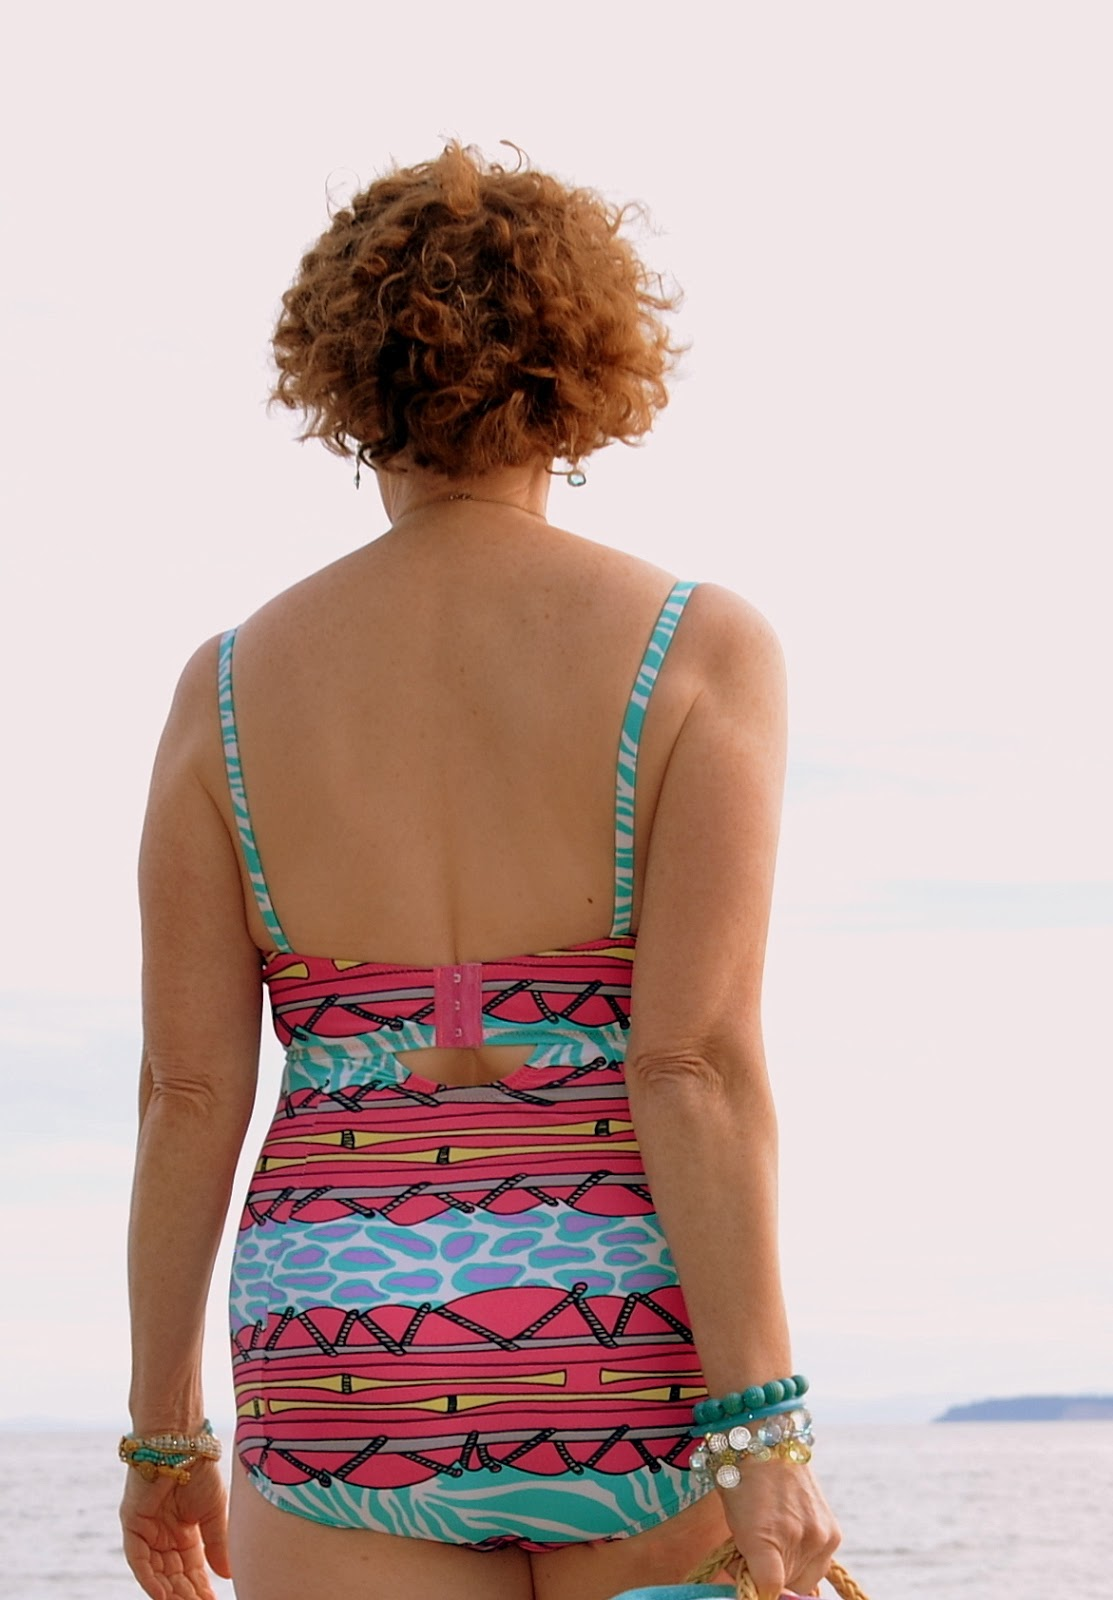 Sophie Swimsuit, Closet Case Files